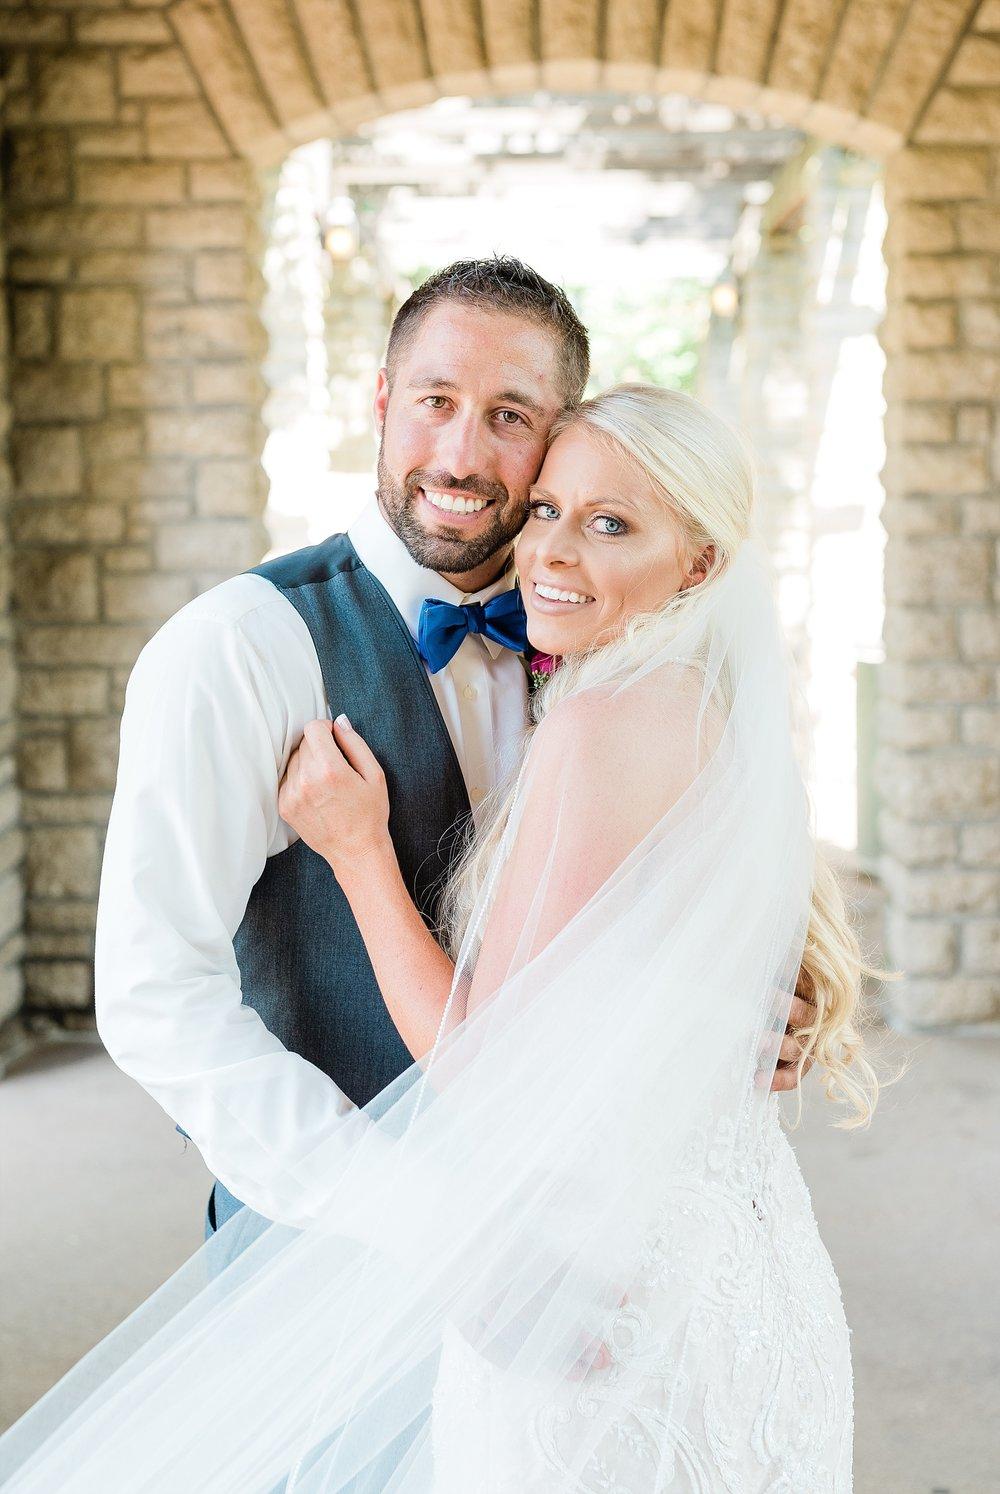 Alan and Heather Horn Wedding by Kelsi Kliethermes Photography Associate - Rachel_0041.jpg